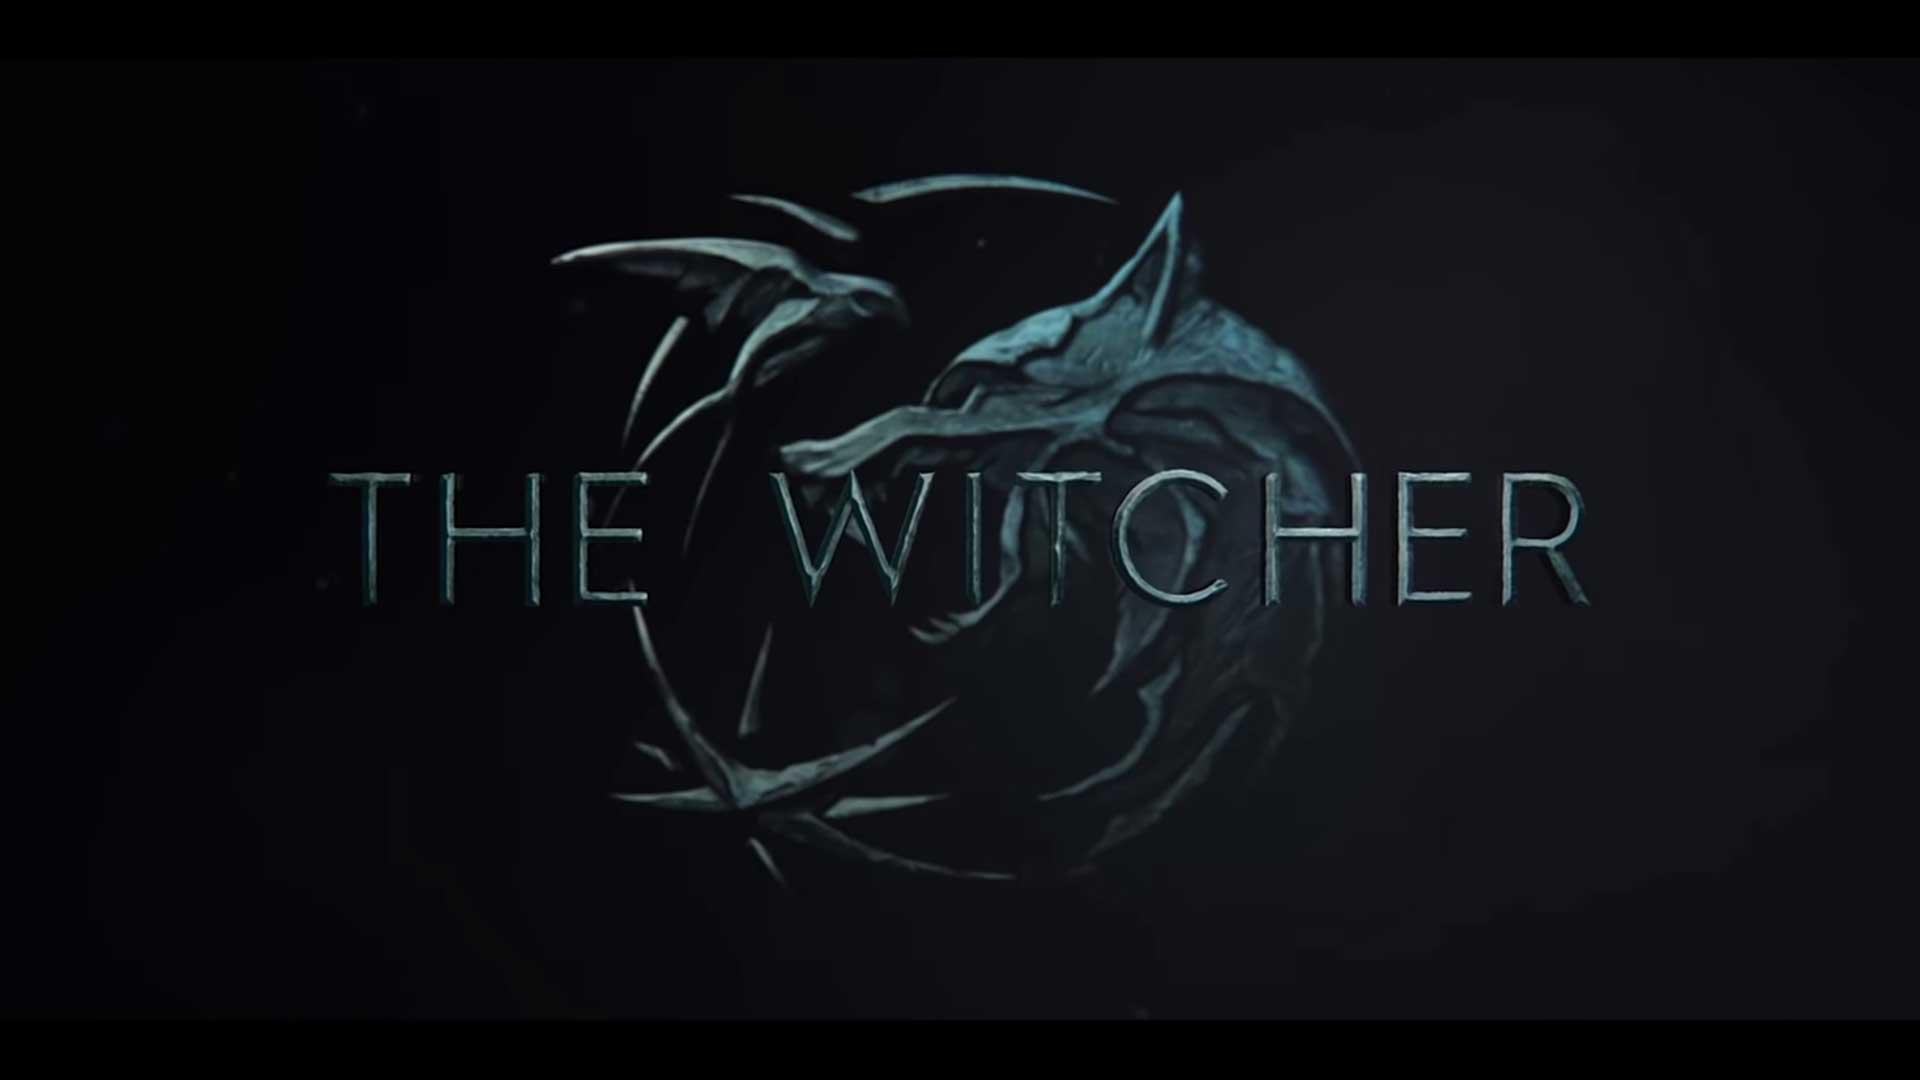 the witcher netflix cover babt